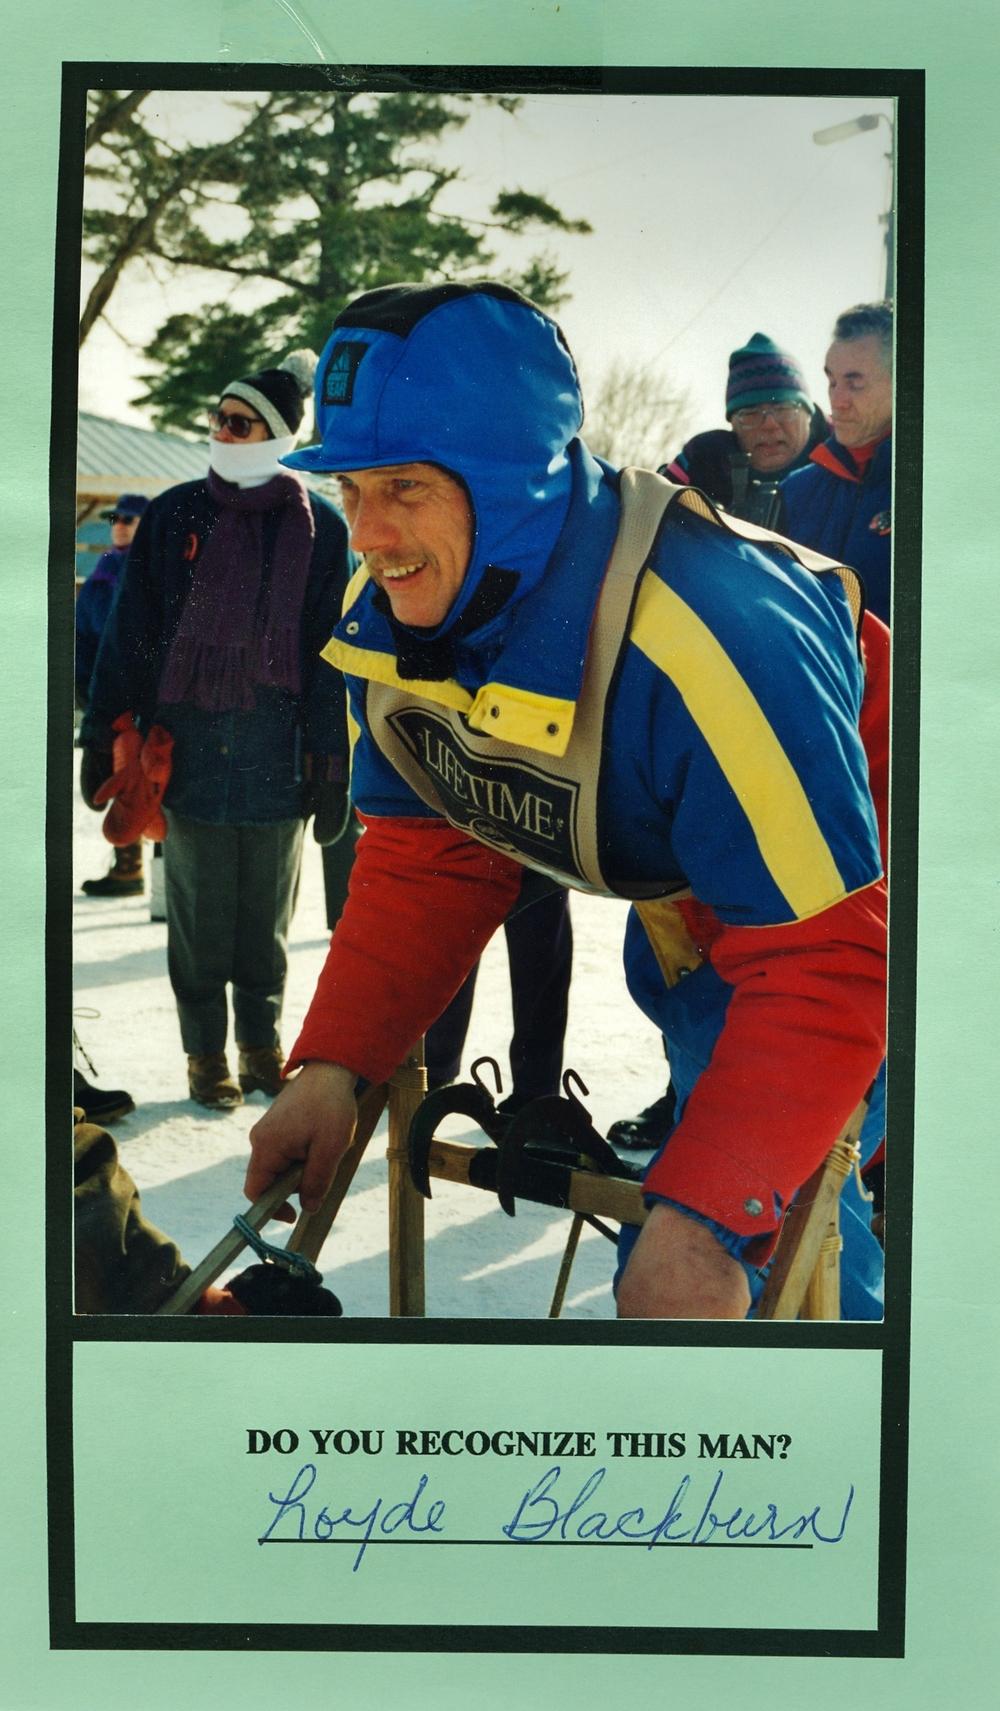 Snofest 1994 Lloyd Blackburn.jpg